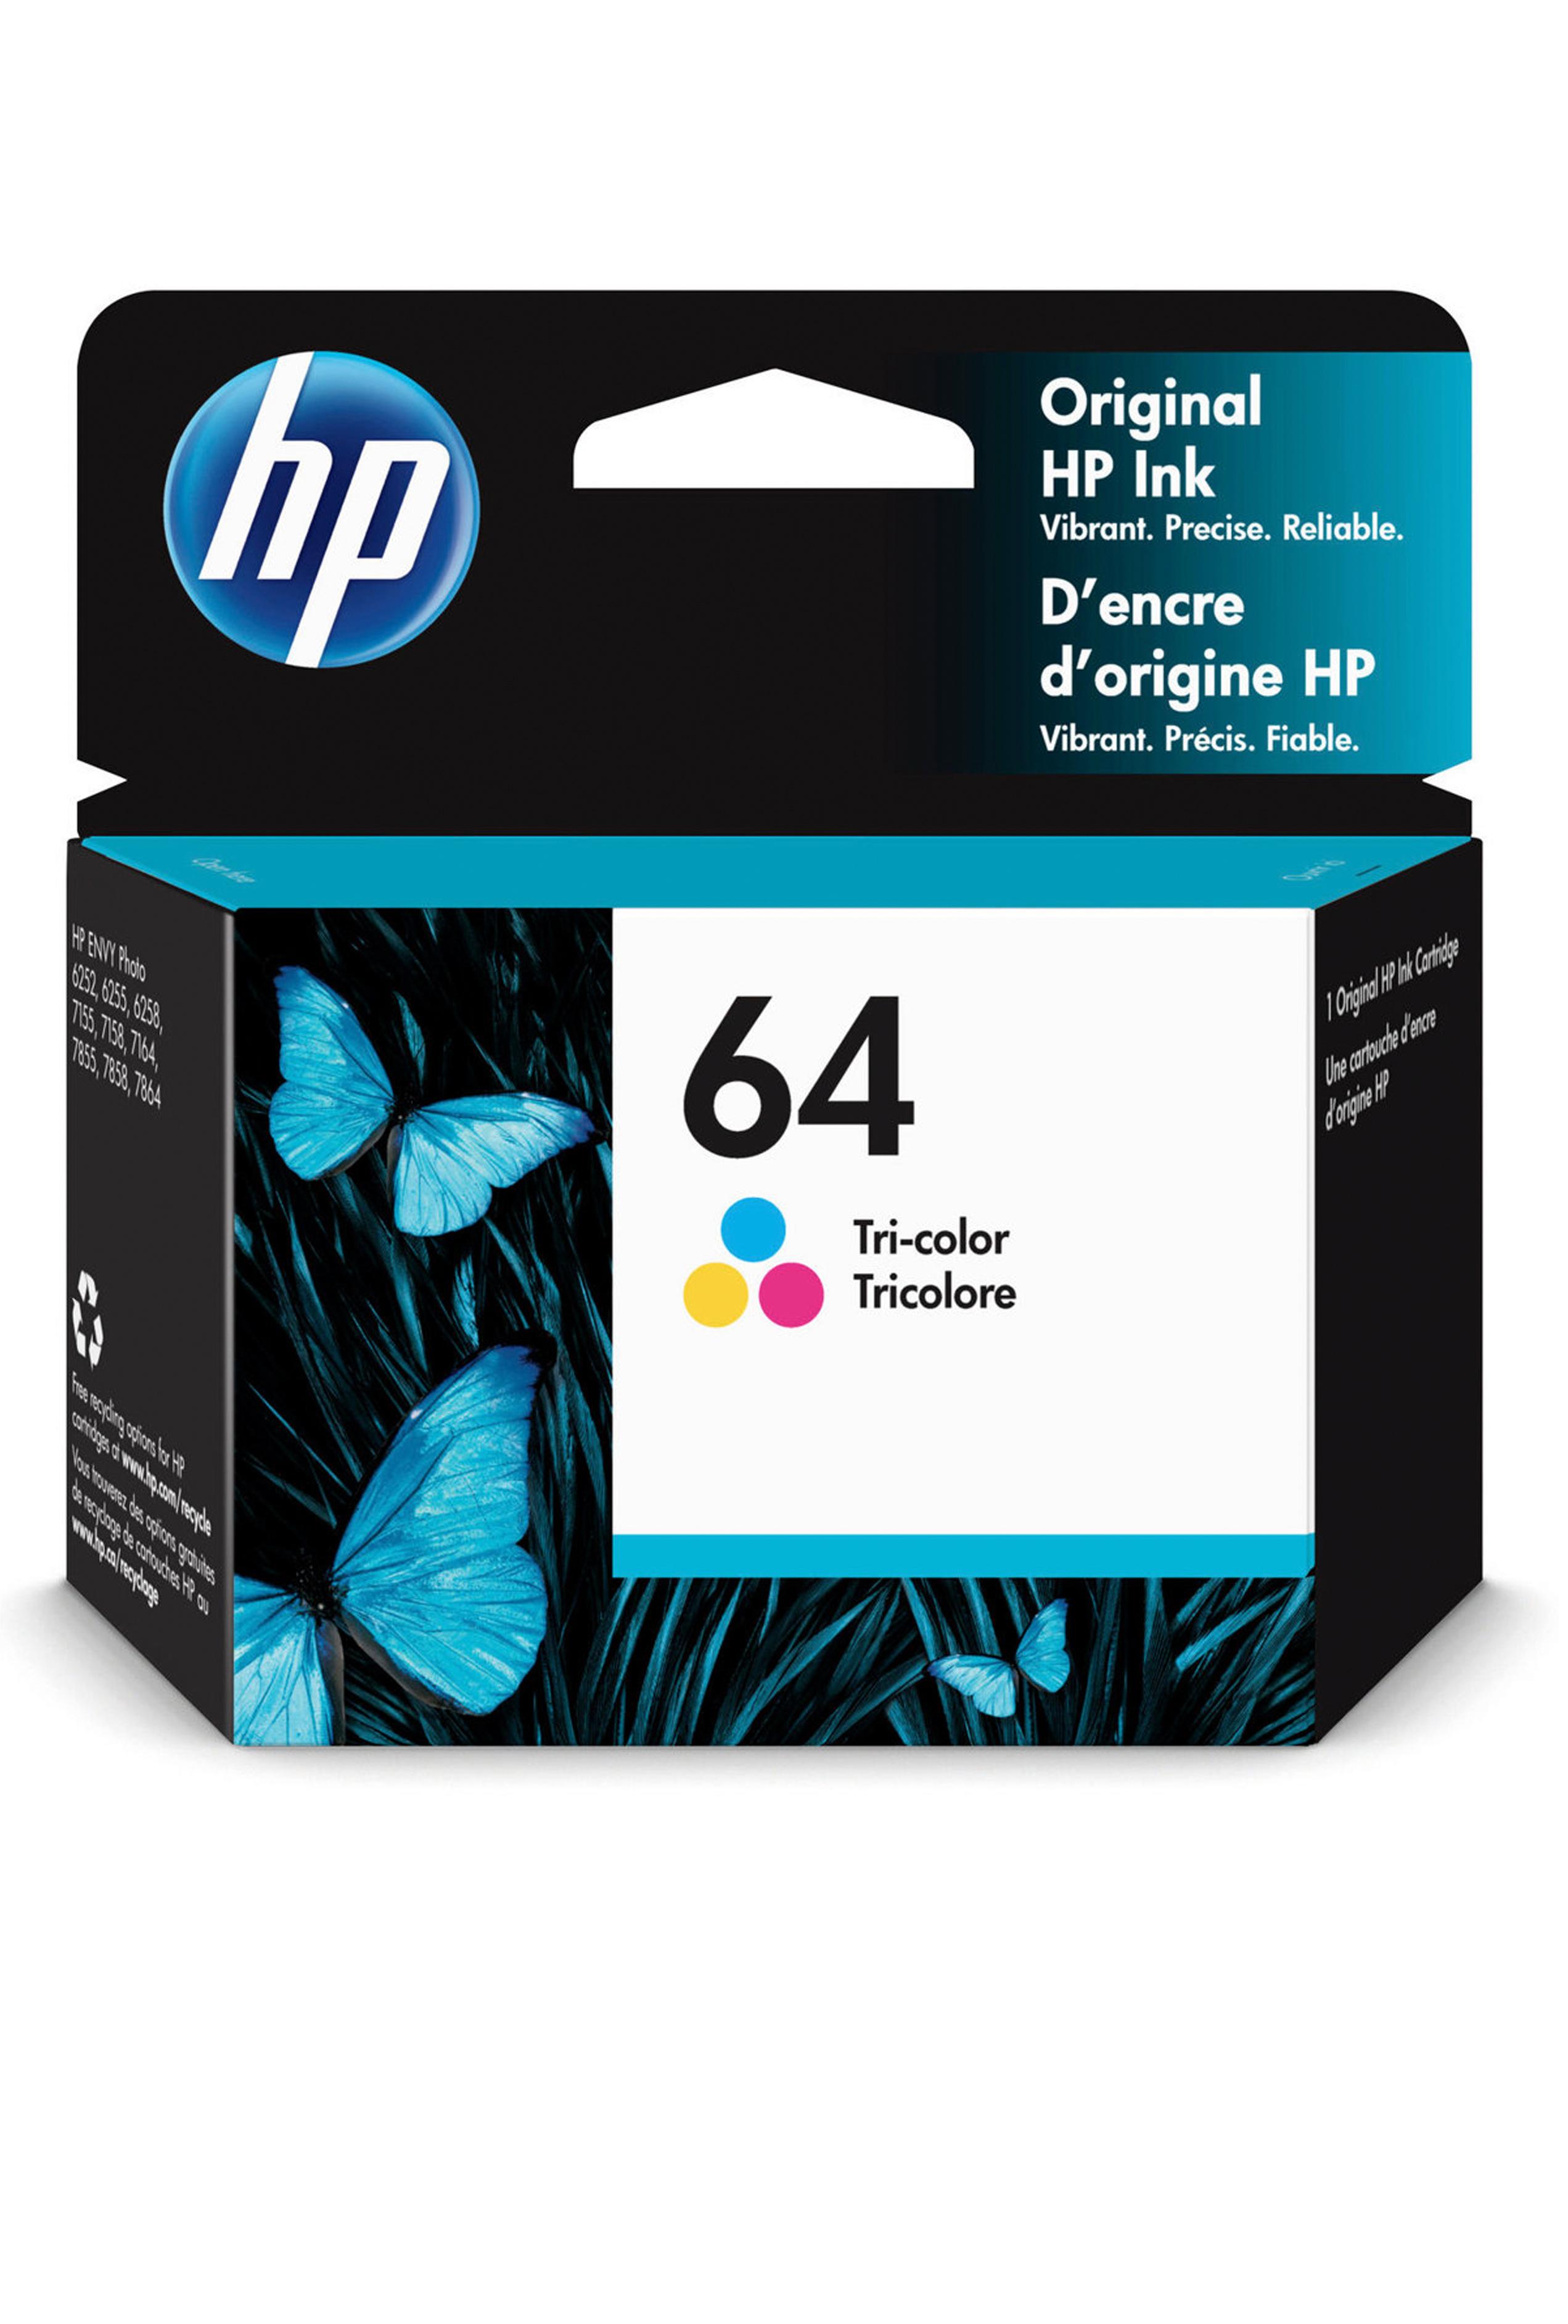 HP TRI-COLOR INK CARTRIDGE (N9J89AN)